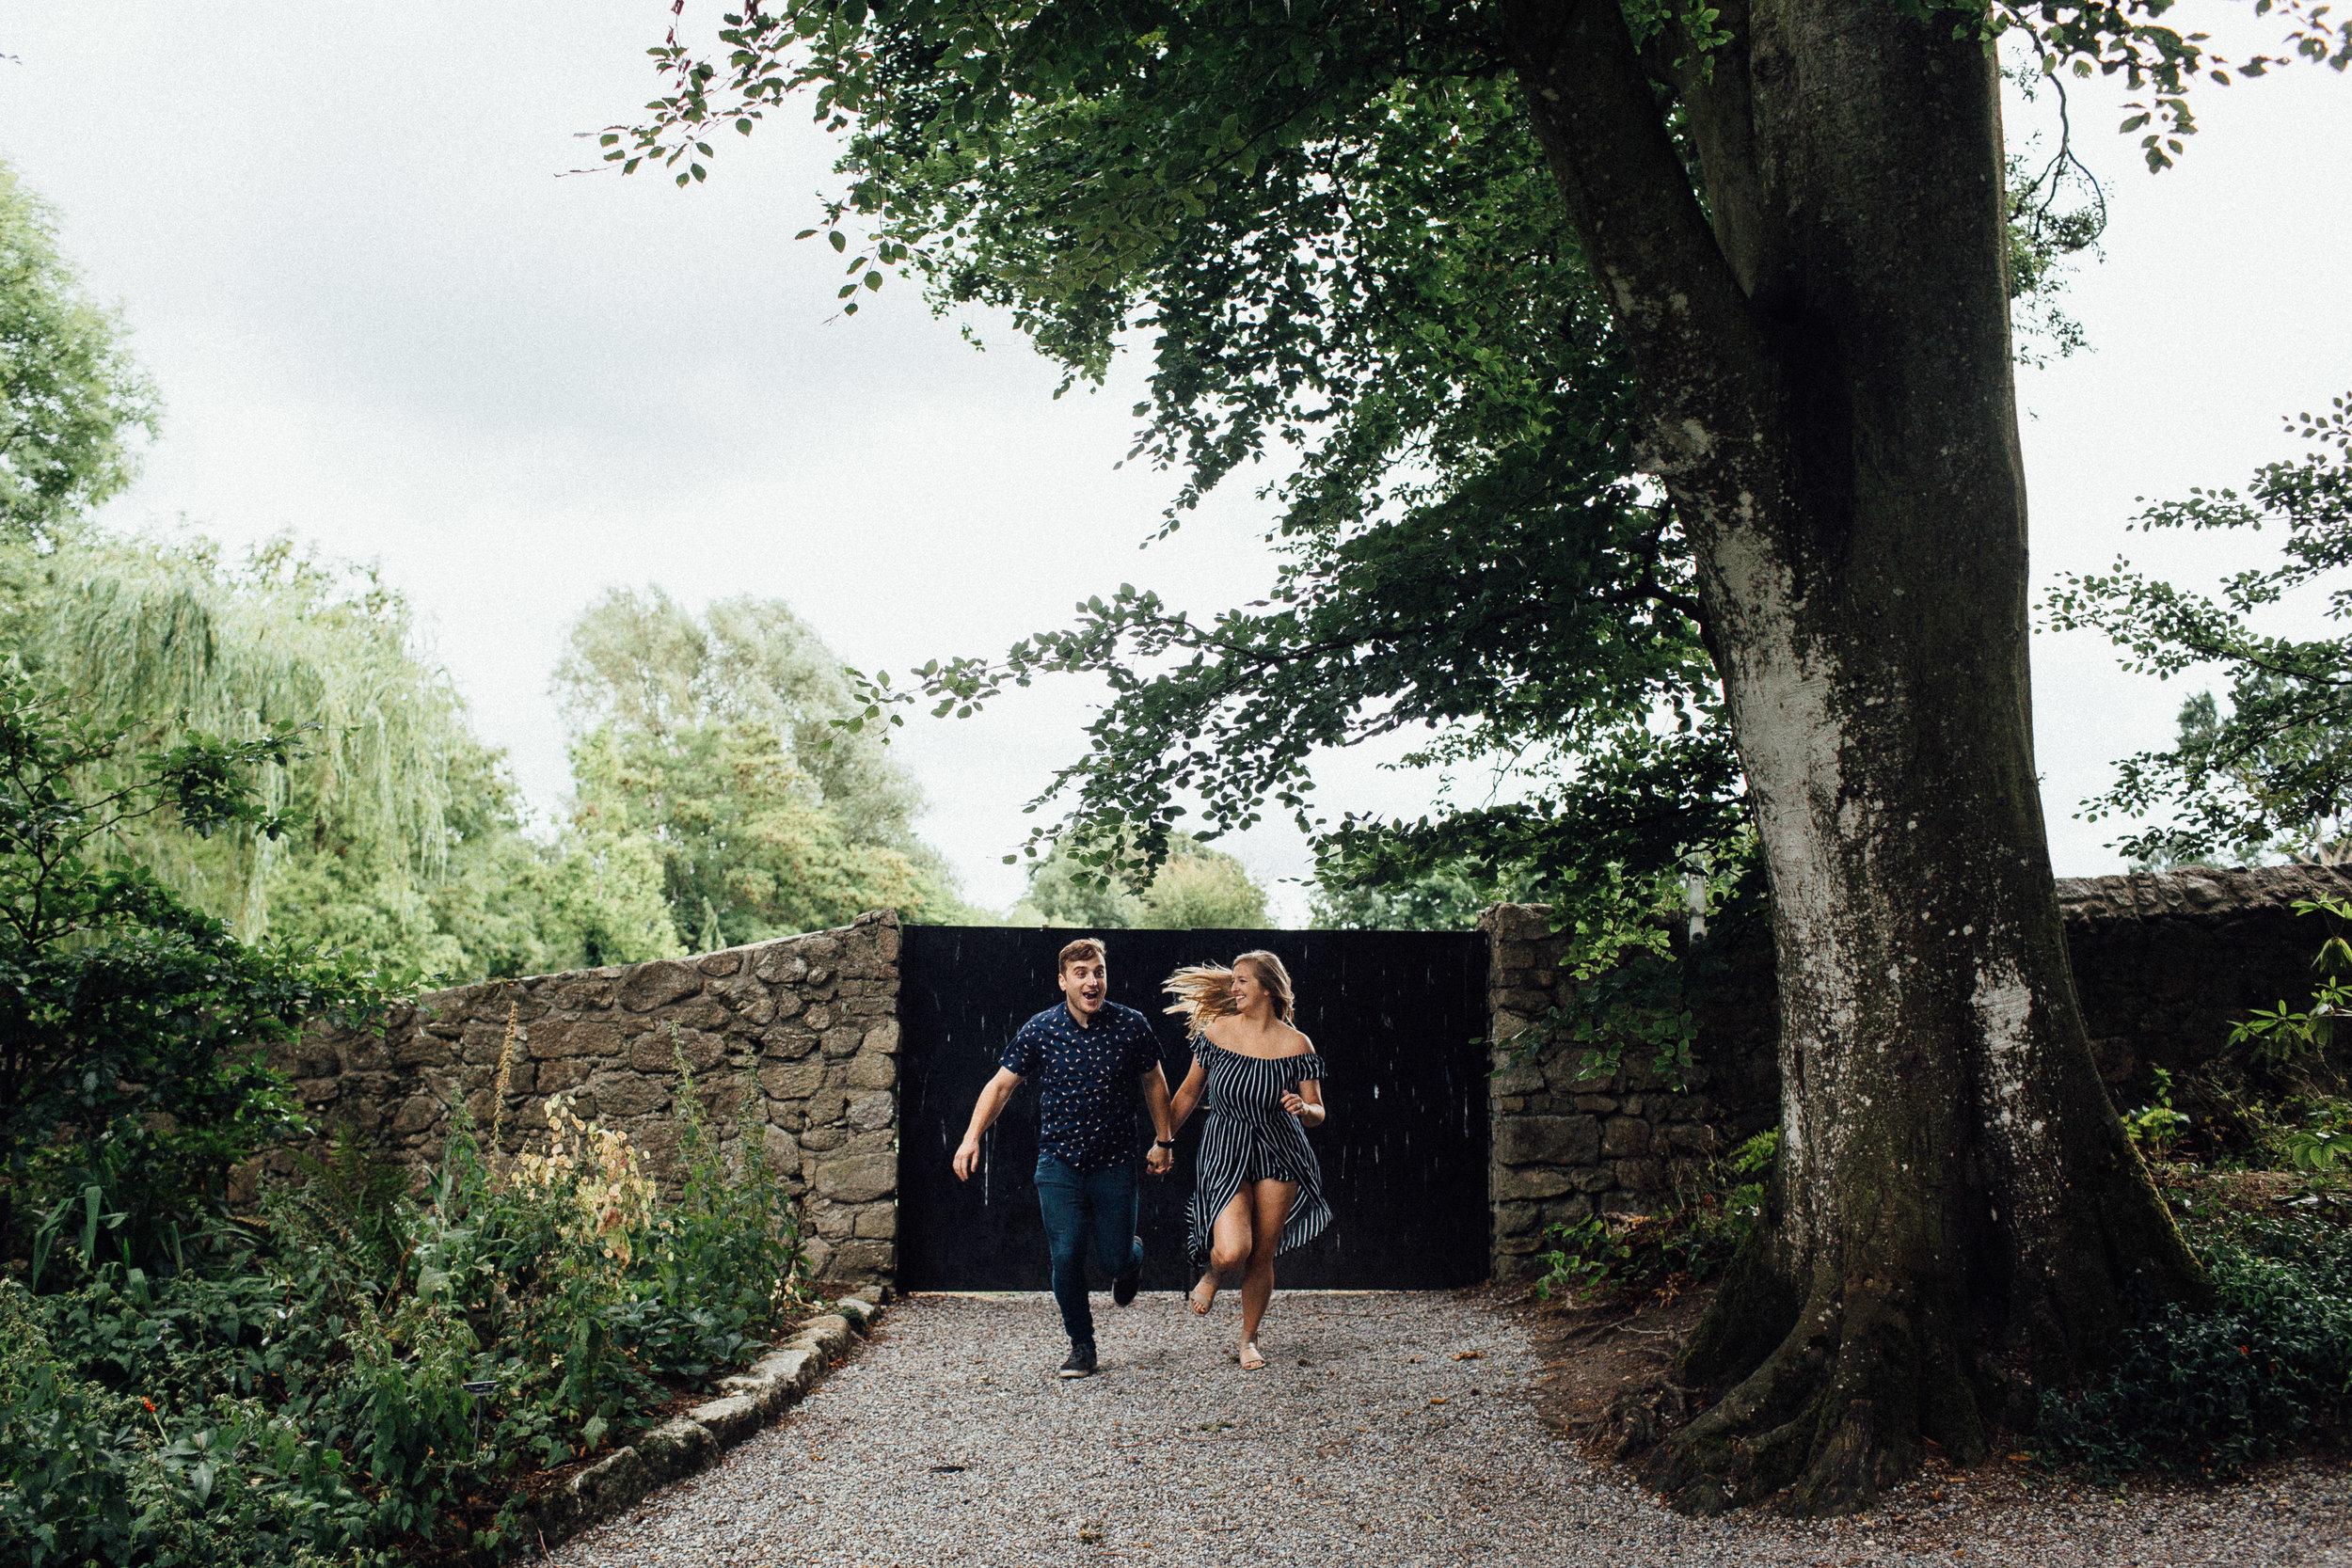 ireland_county_wicklow_glendalough_engagement_adventure_photography_windy_moody_atlanta_wedding_photographer_1004.jpg